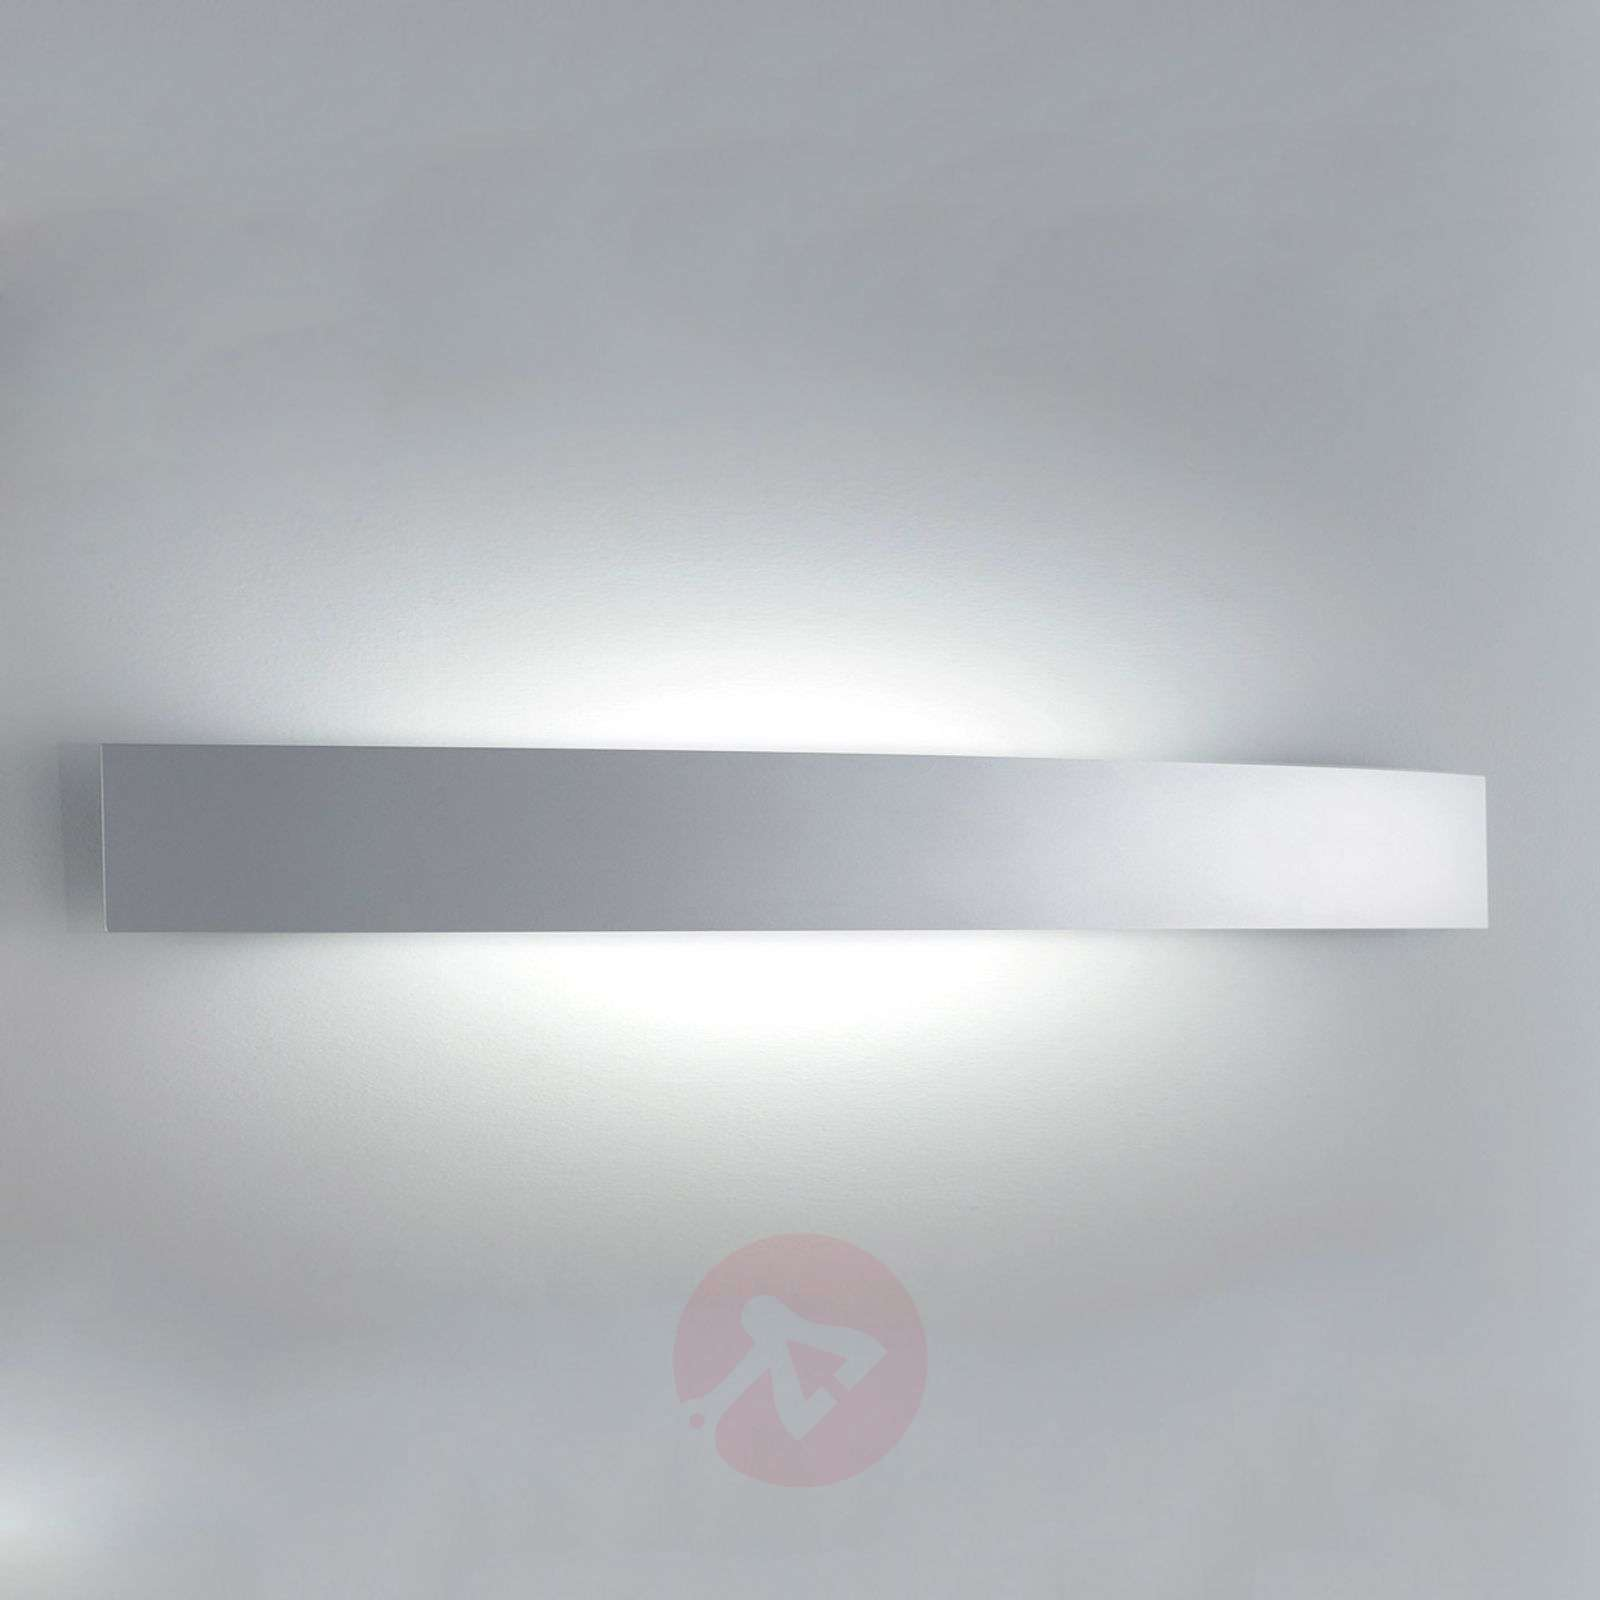 Elegant wall light RIGA, 56 cm wide-3520221X-01